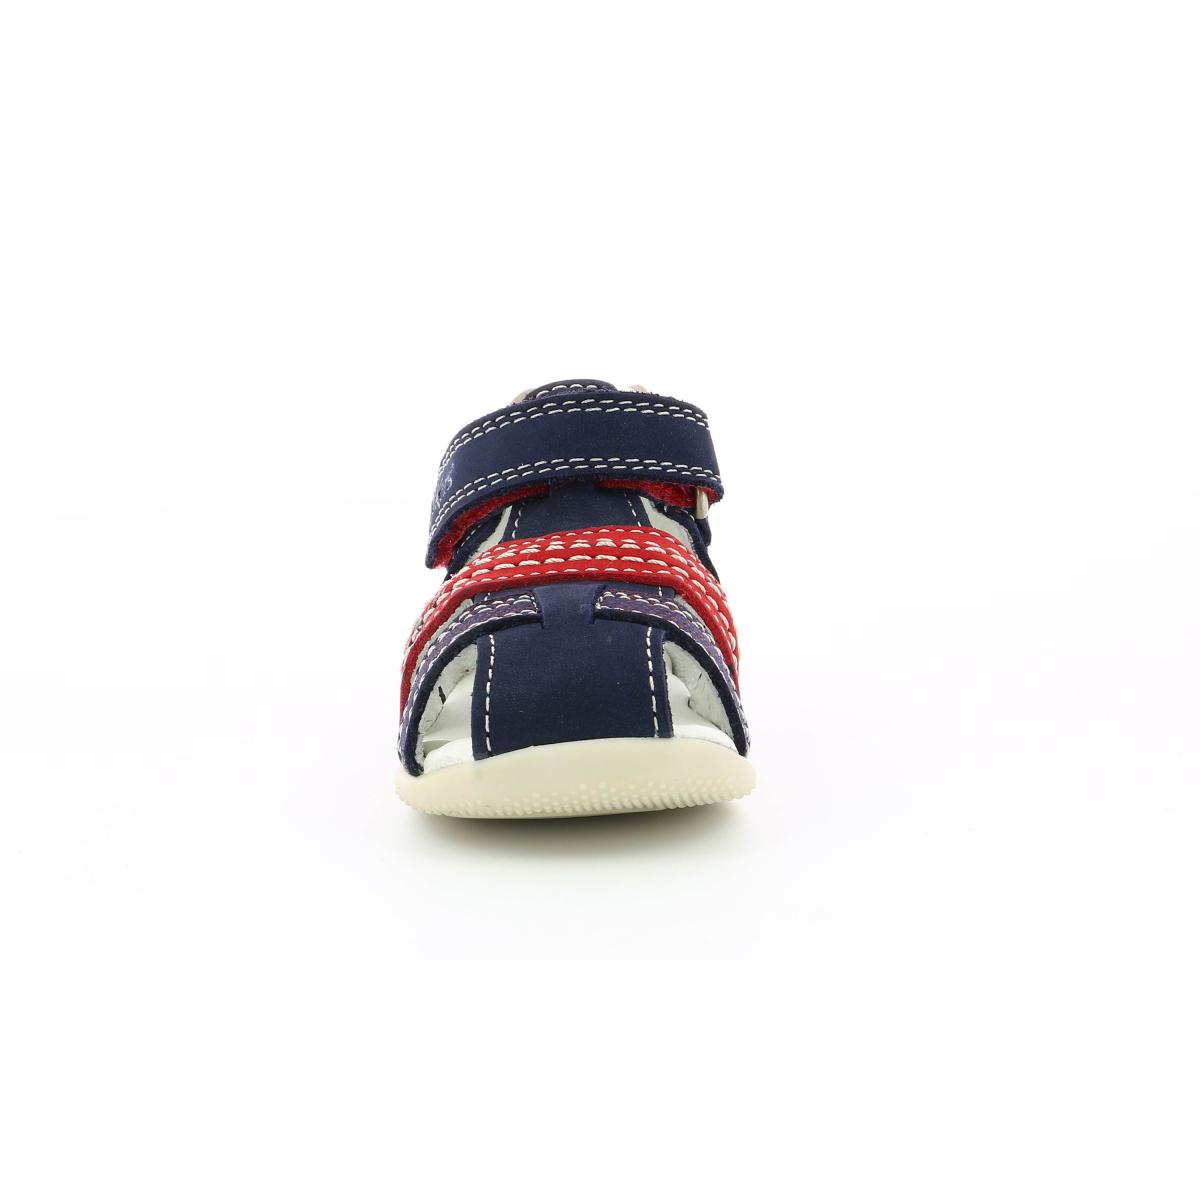 9a56a4480264 Chaussures Enfant BONUS ROUGE MARINE - Kickers